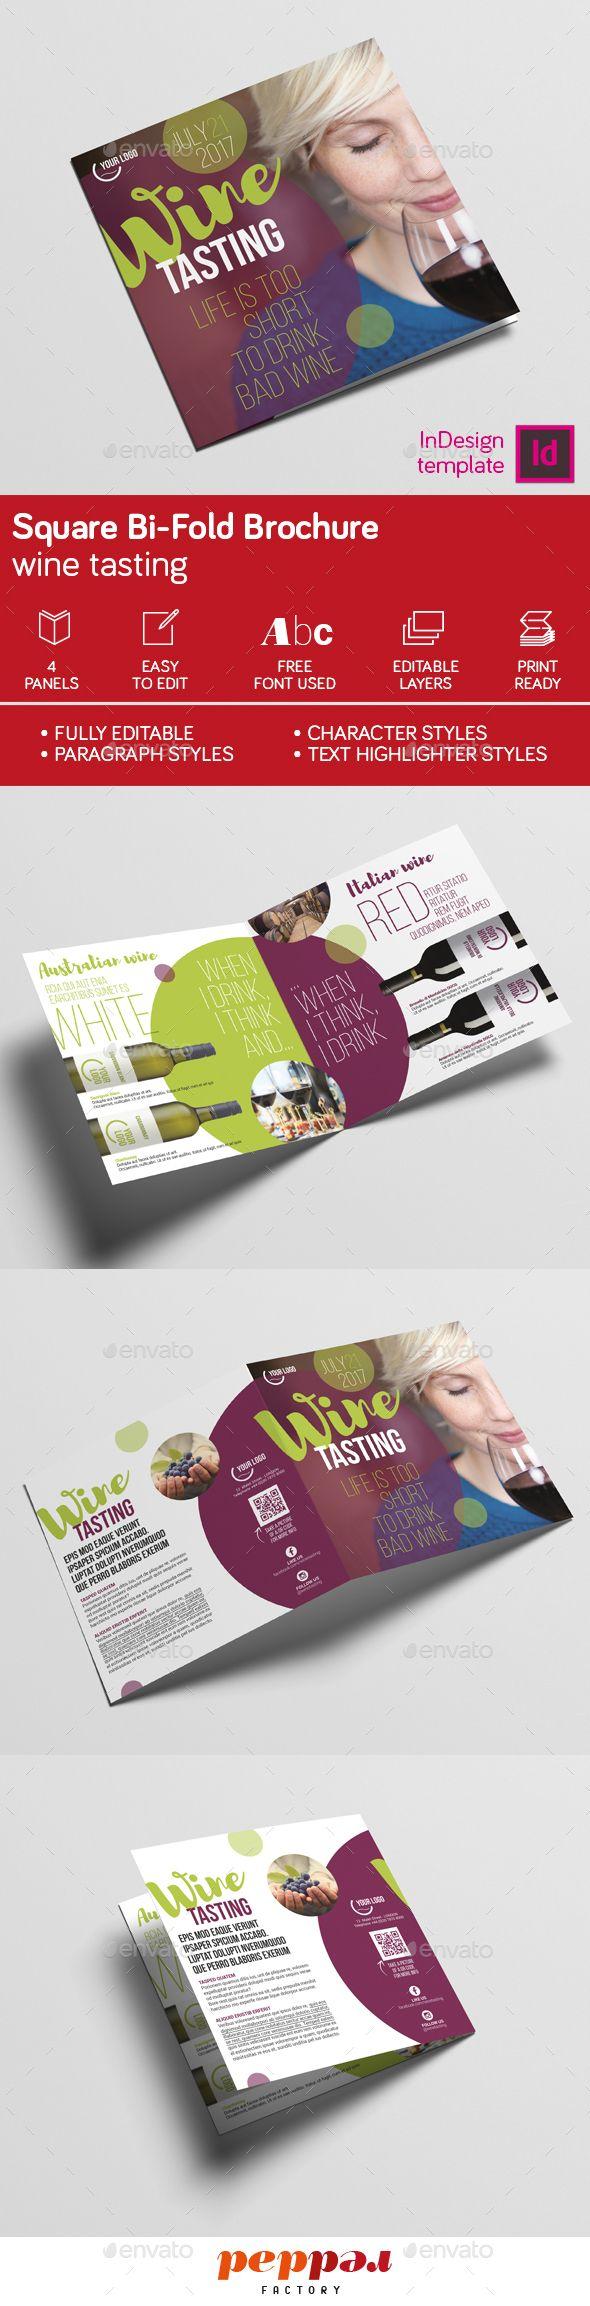 Wine Square Bi Fold Brochure Pinterest Brochure Template